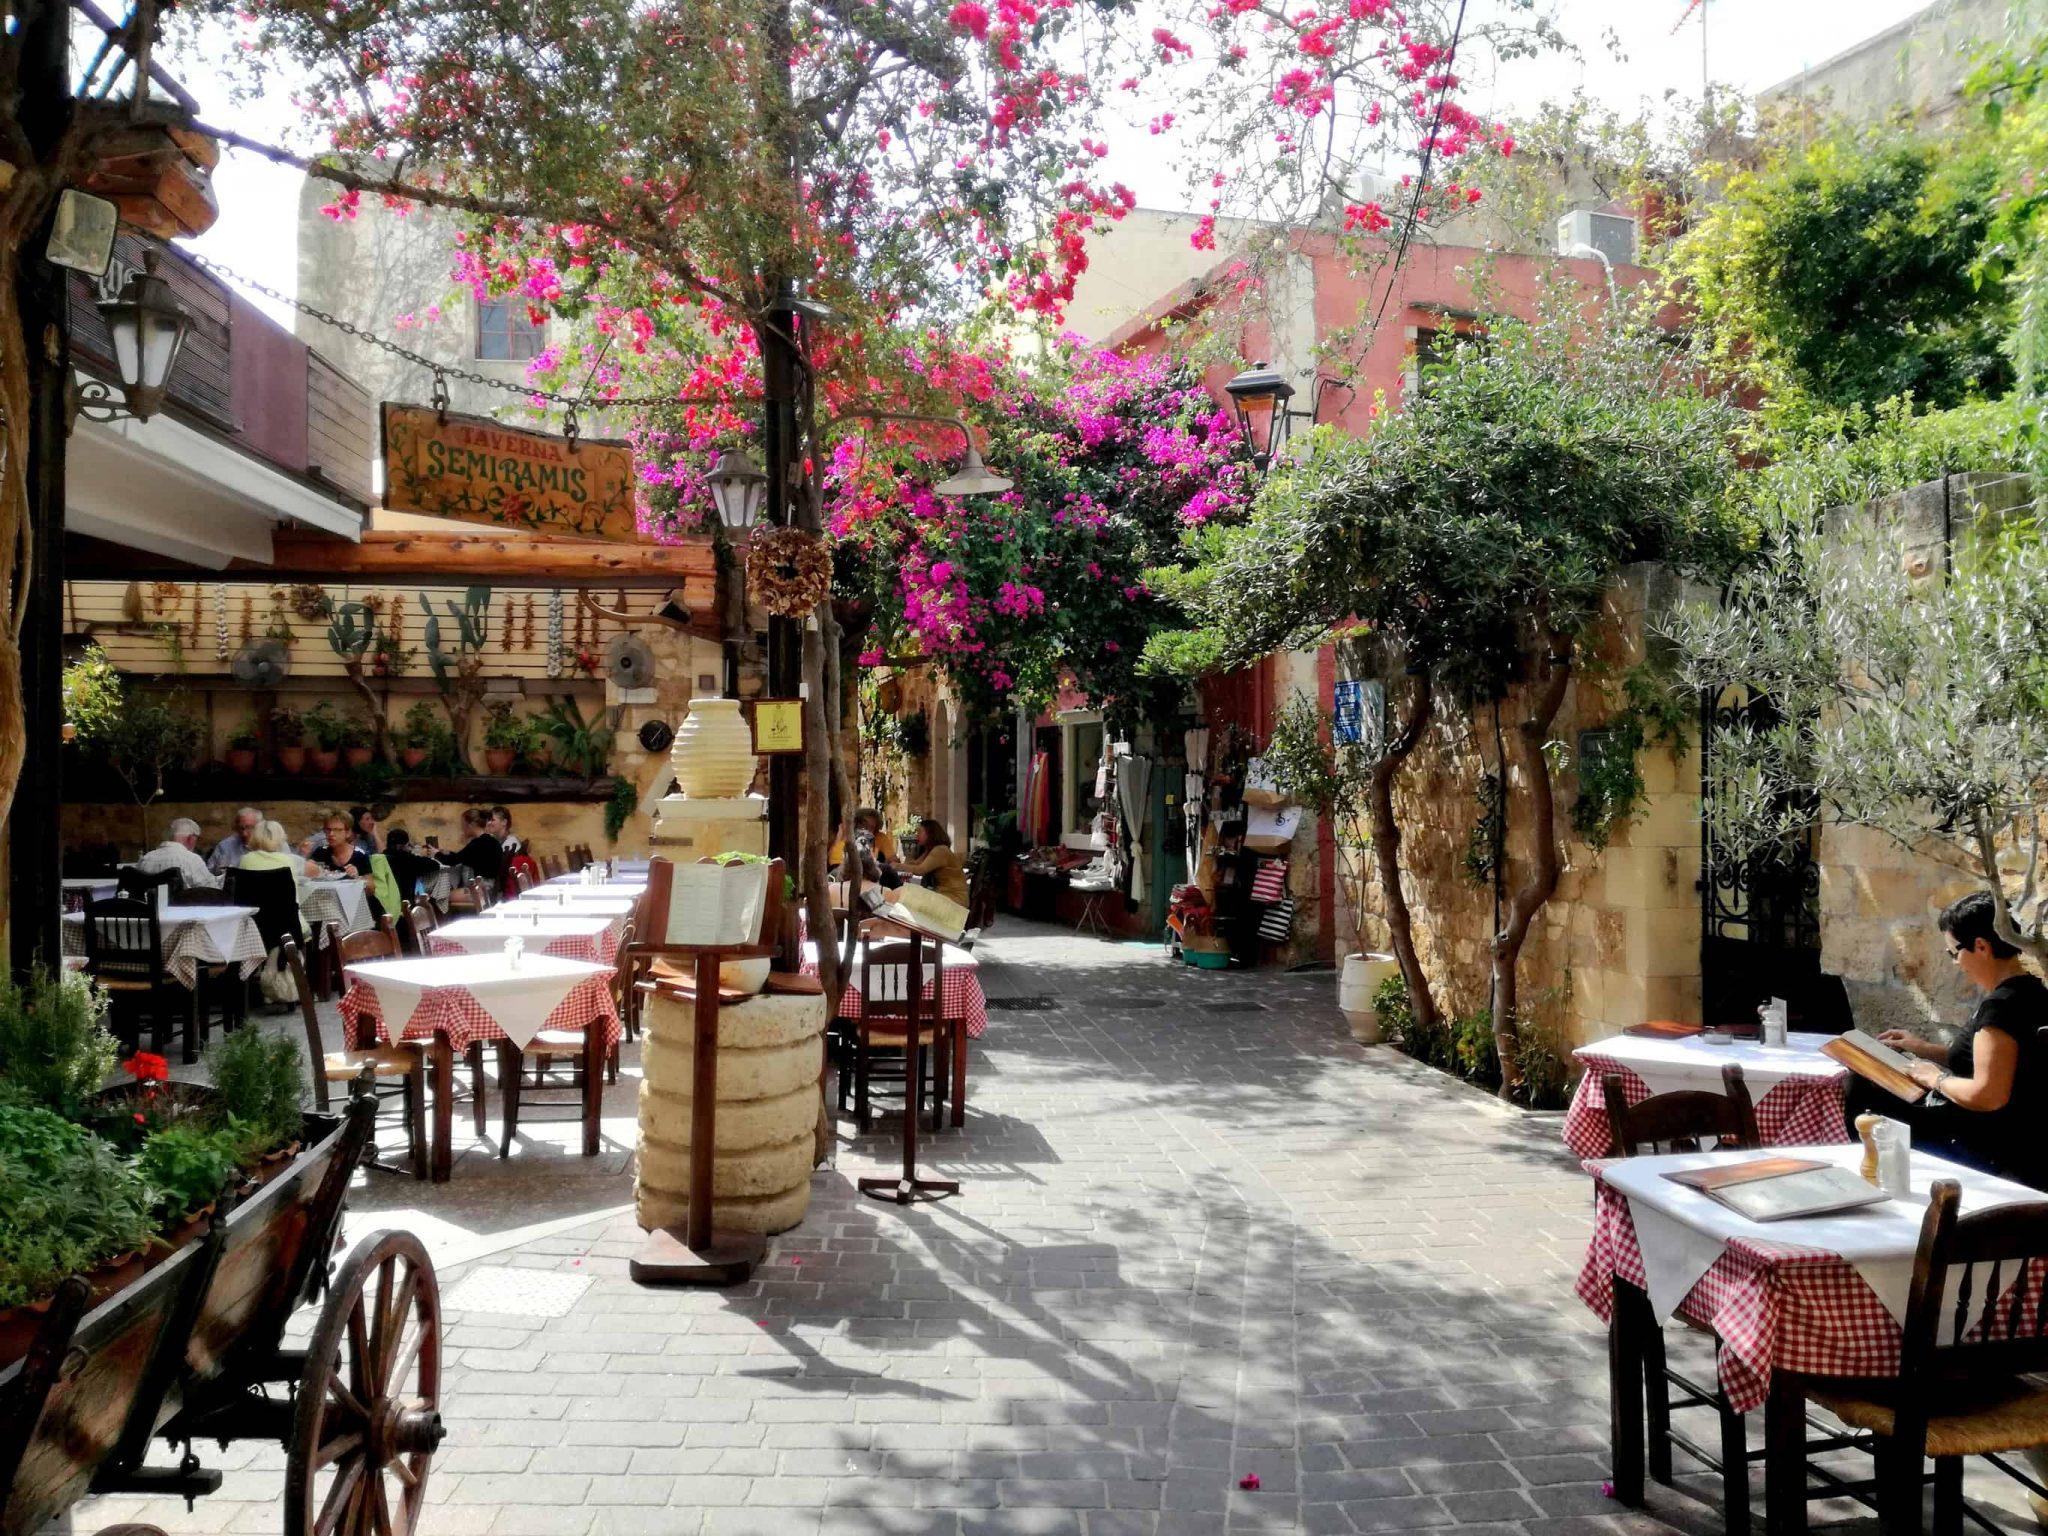 Chania street - 14 Days Thai Massage Training and Yoga Retreat in Crete Greece